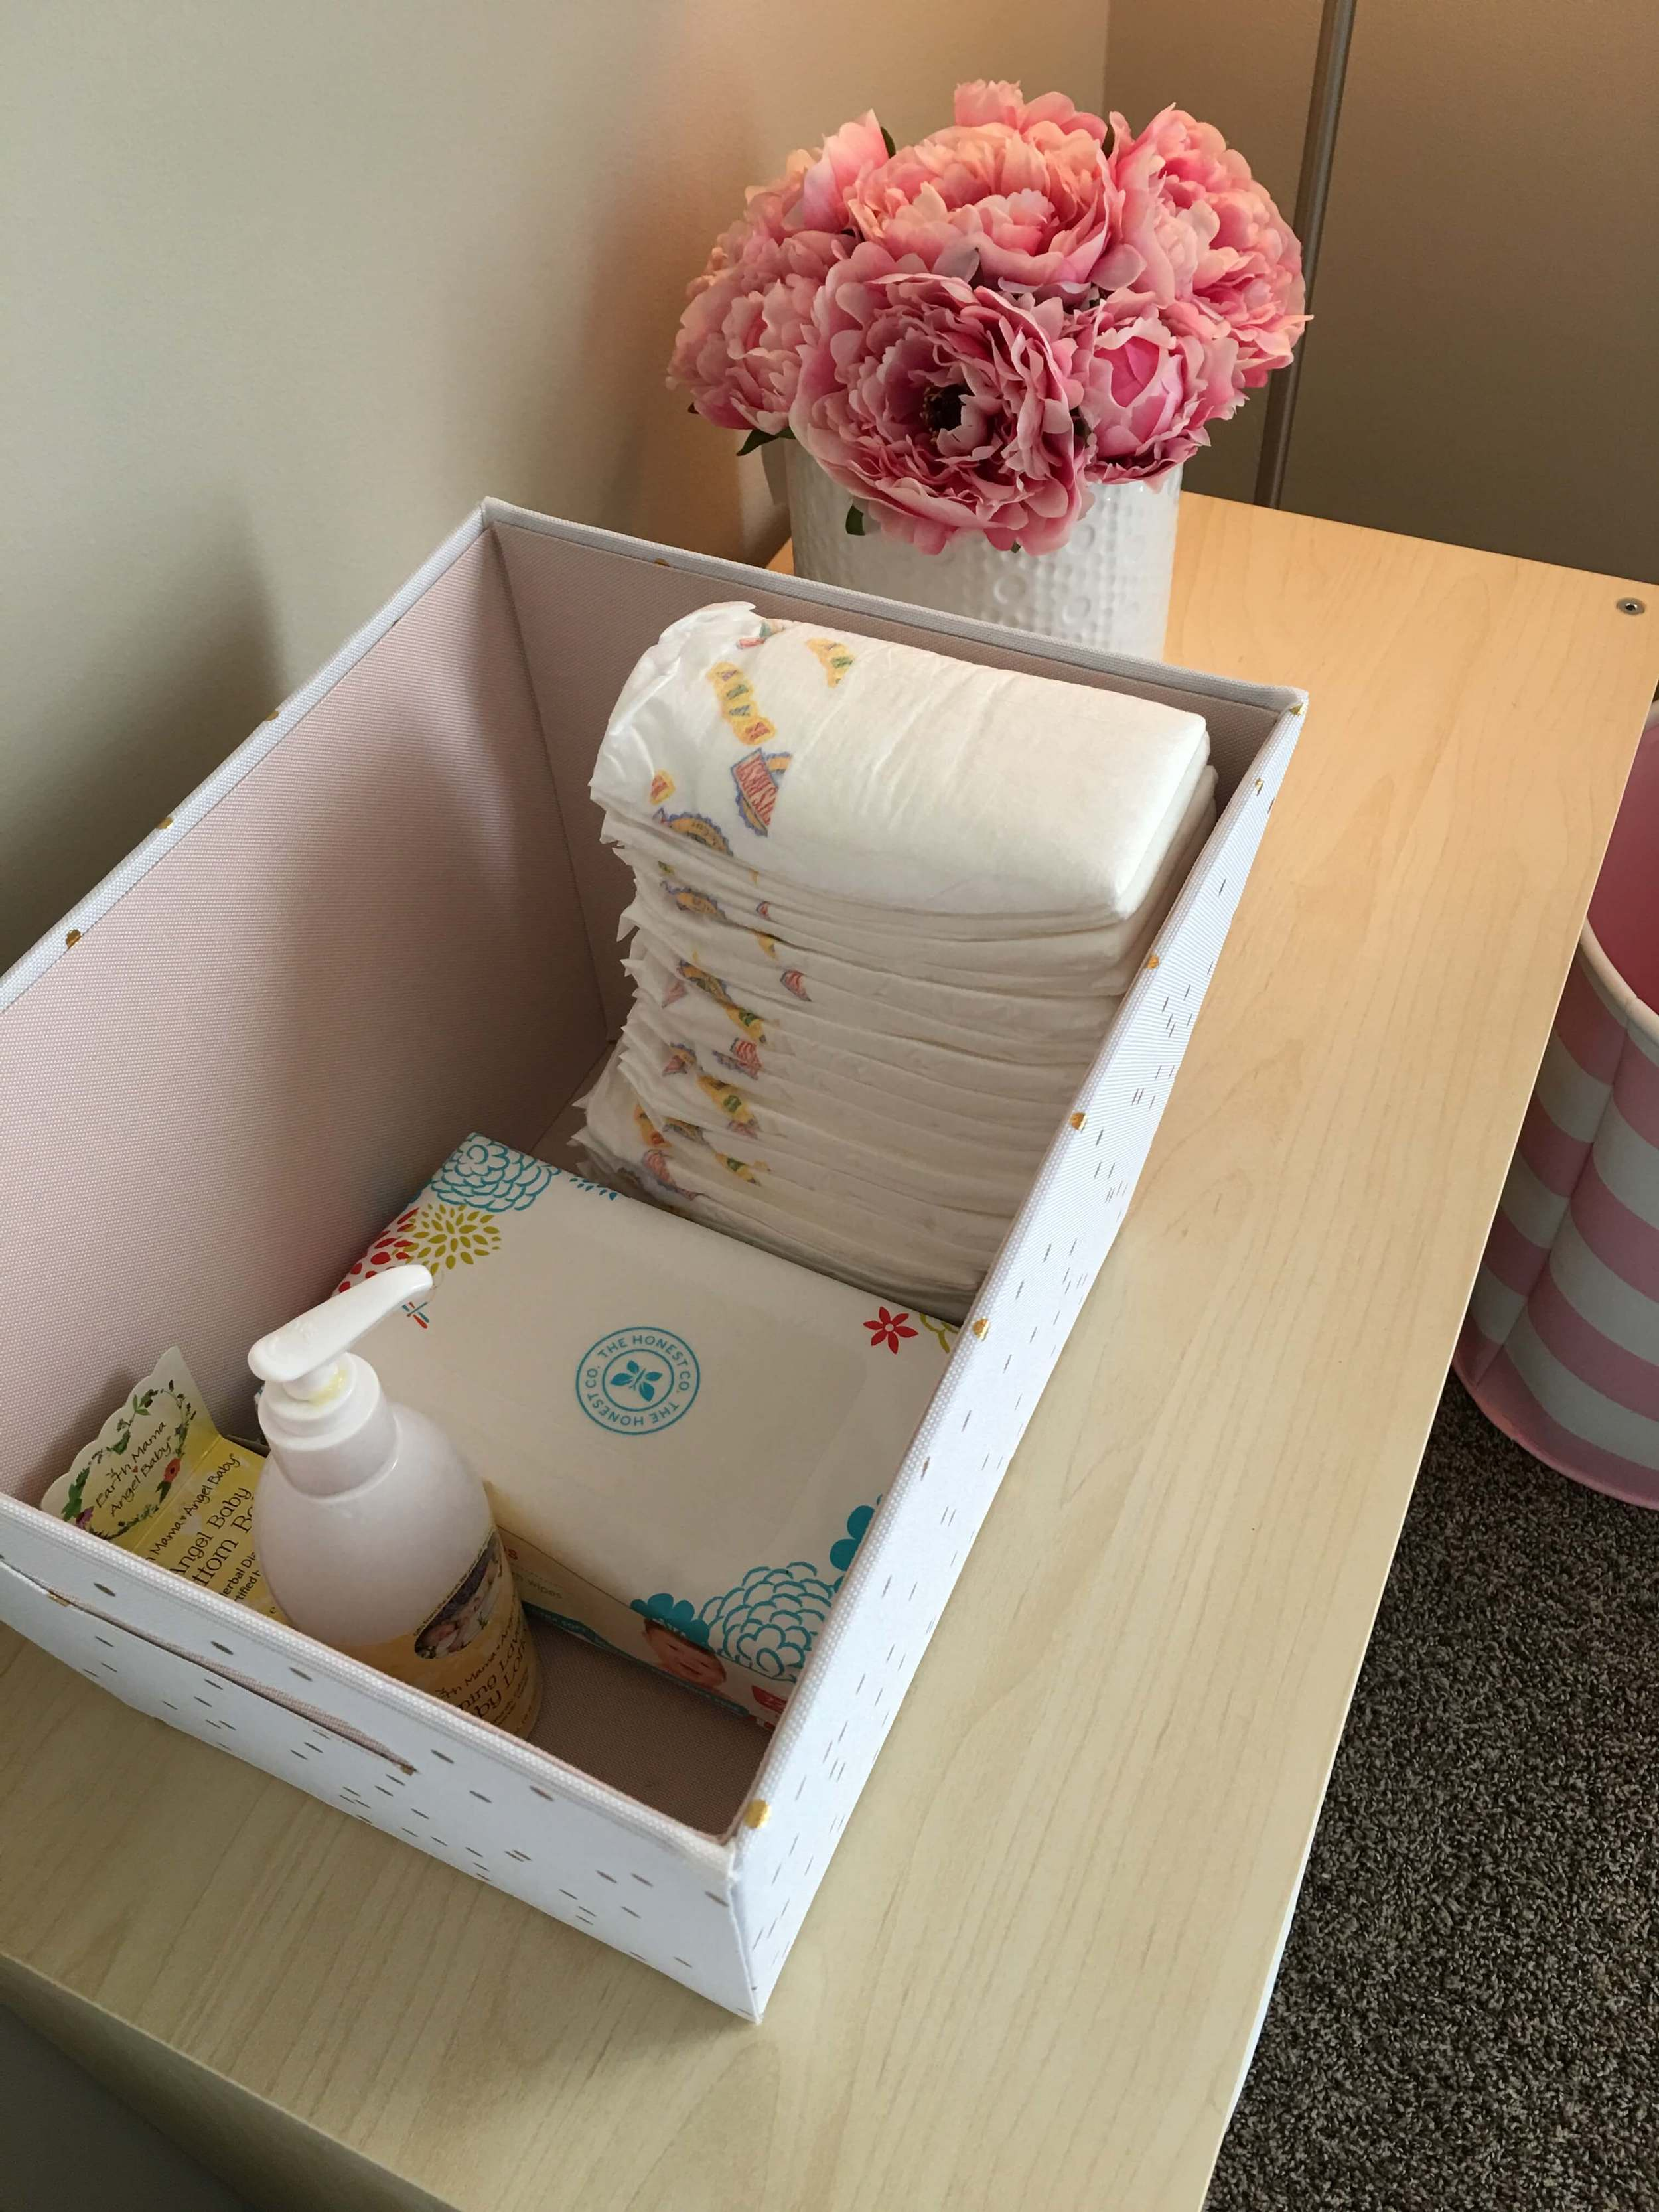 Diaper supplies